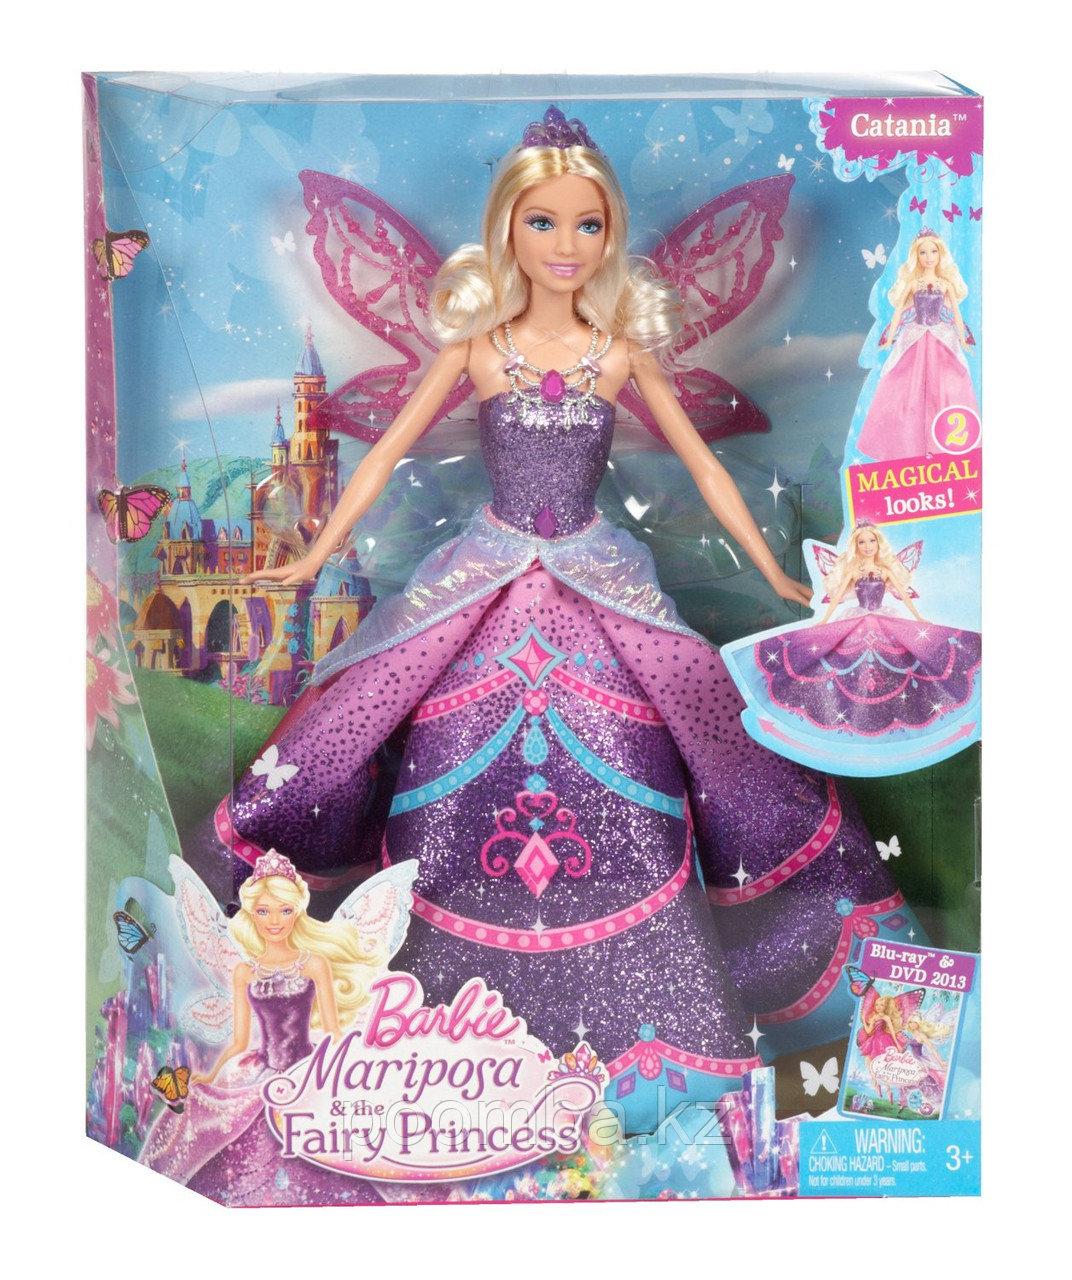 Барби Принцесса Фей, Catania, Barbie Принцесса Фей